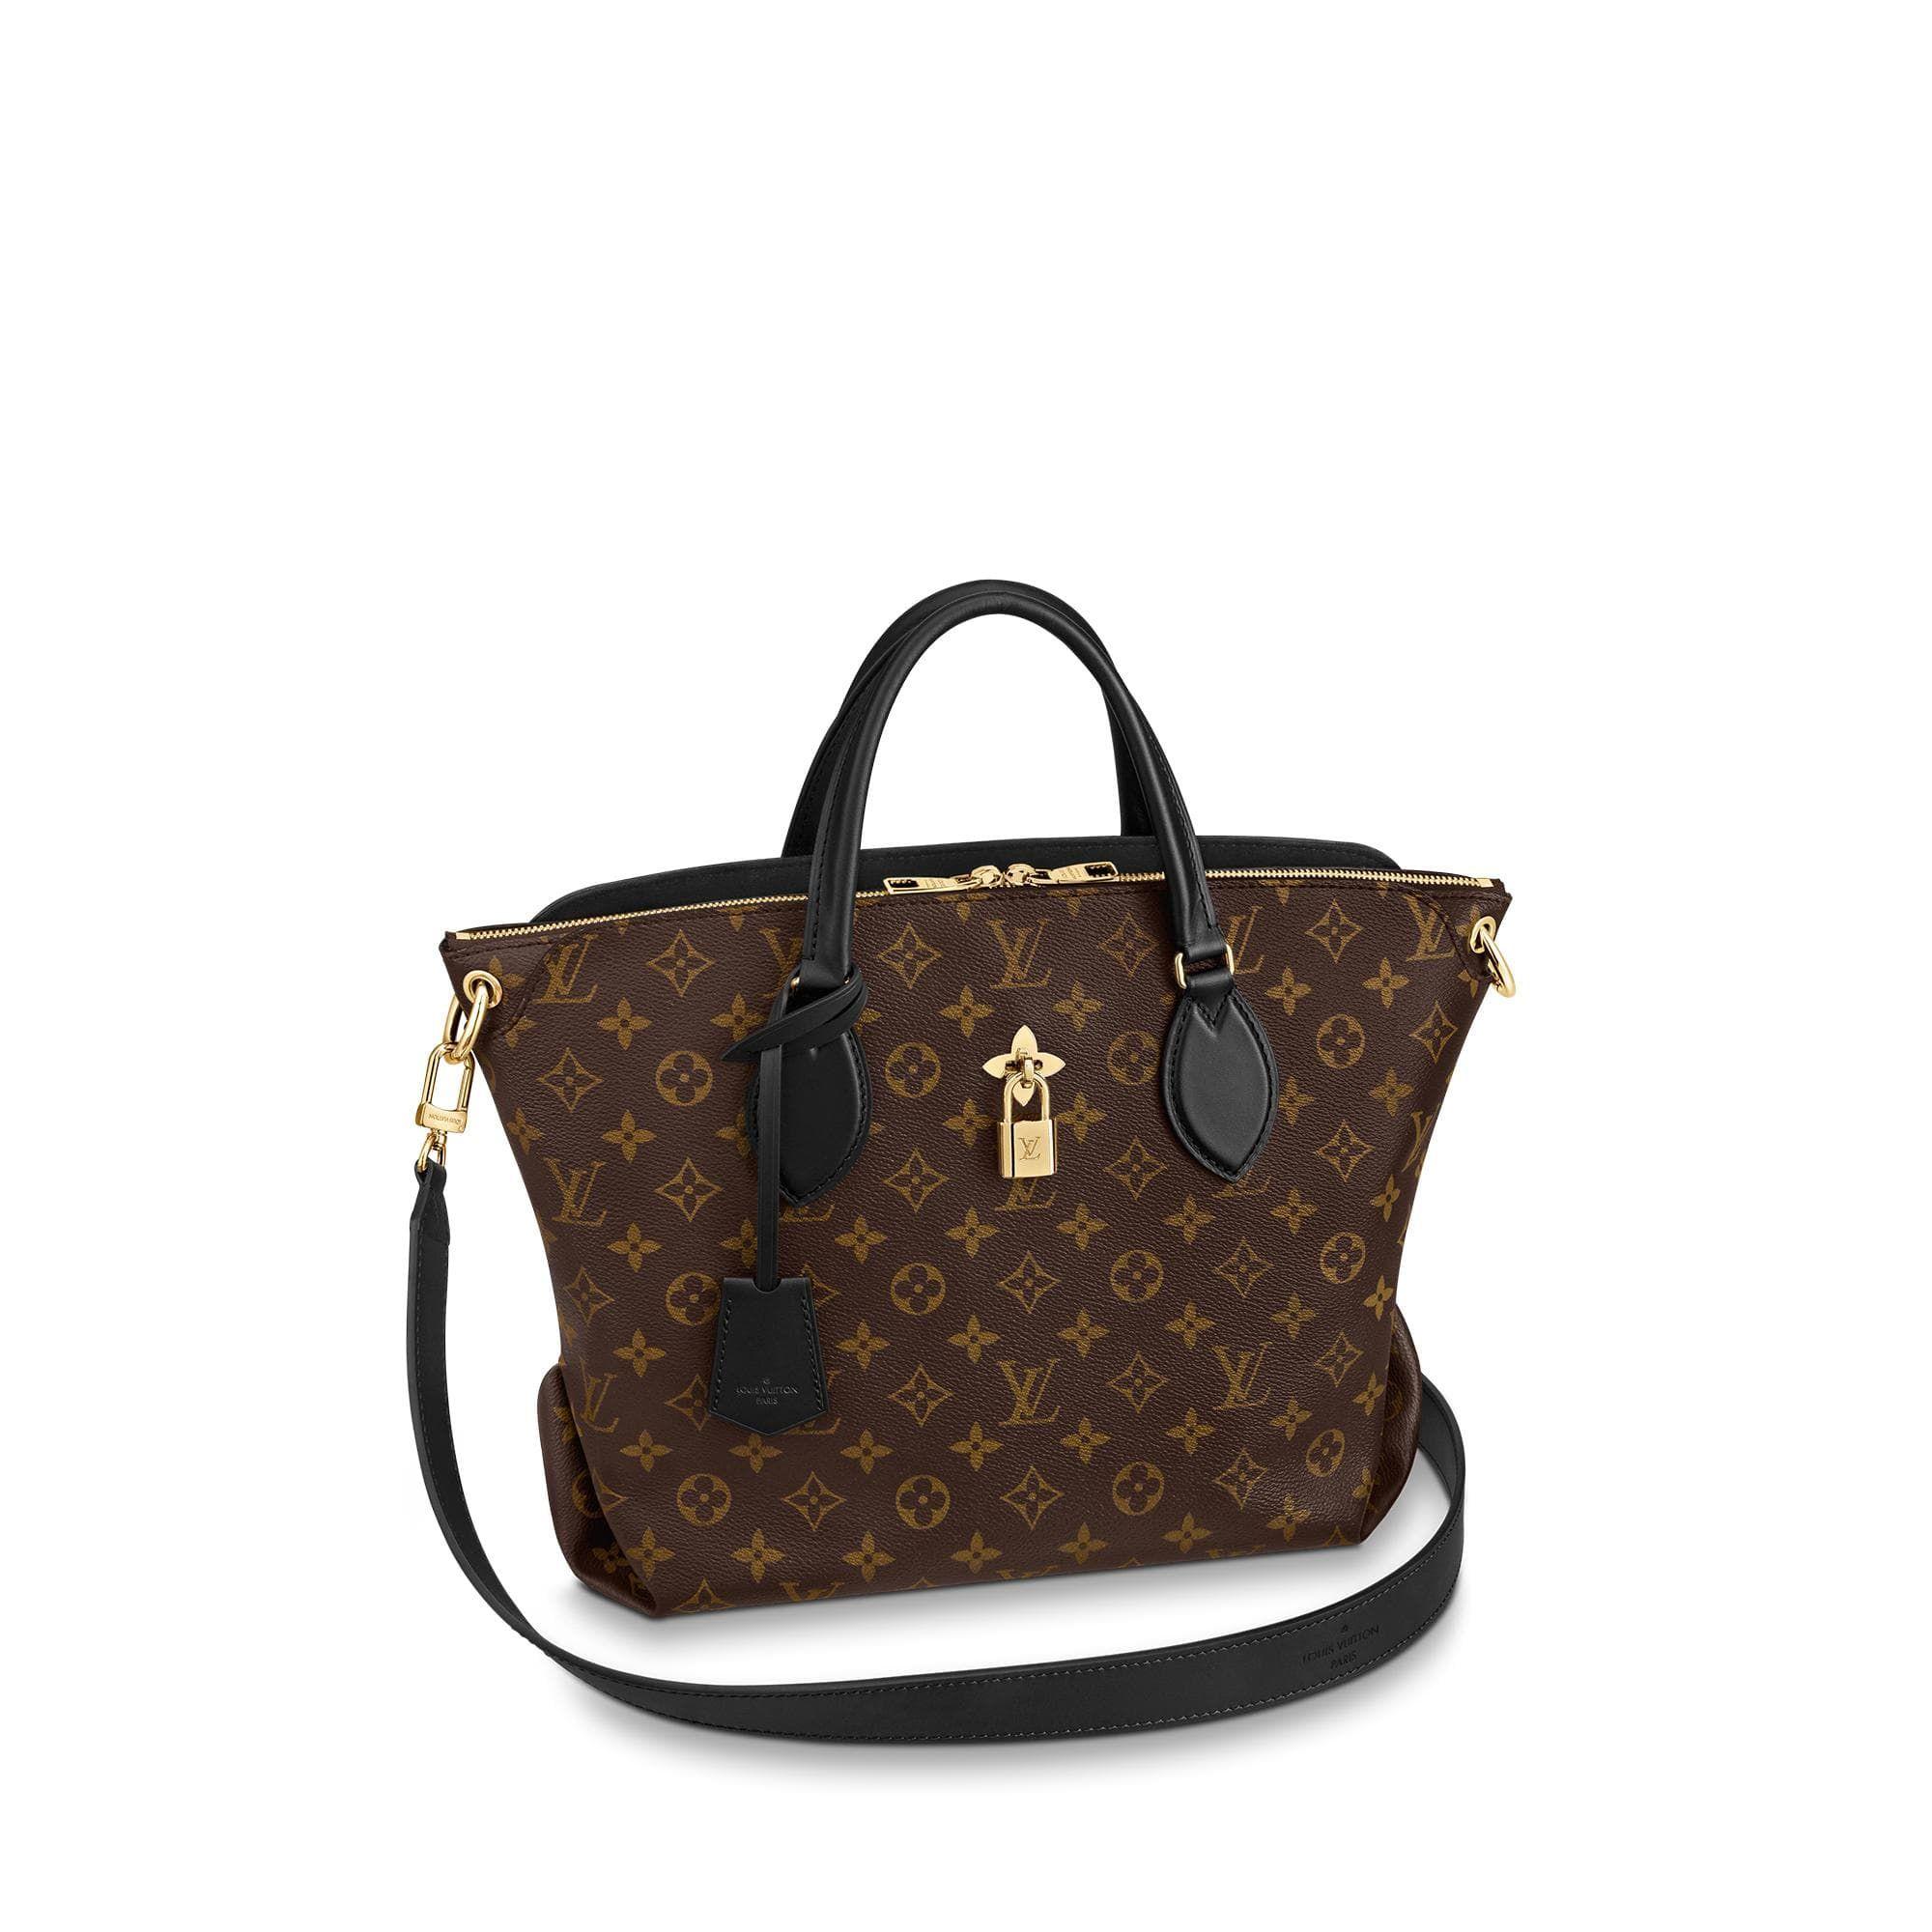 Flower Zipped Tote Mm Louis Vuitton Handbags Louis Vuitton